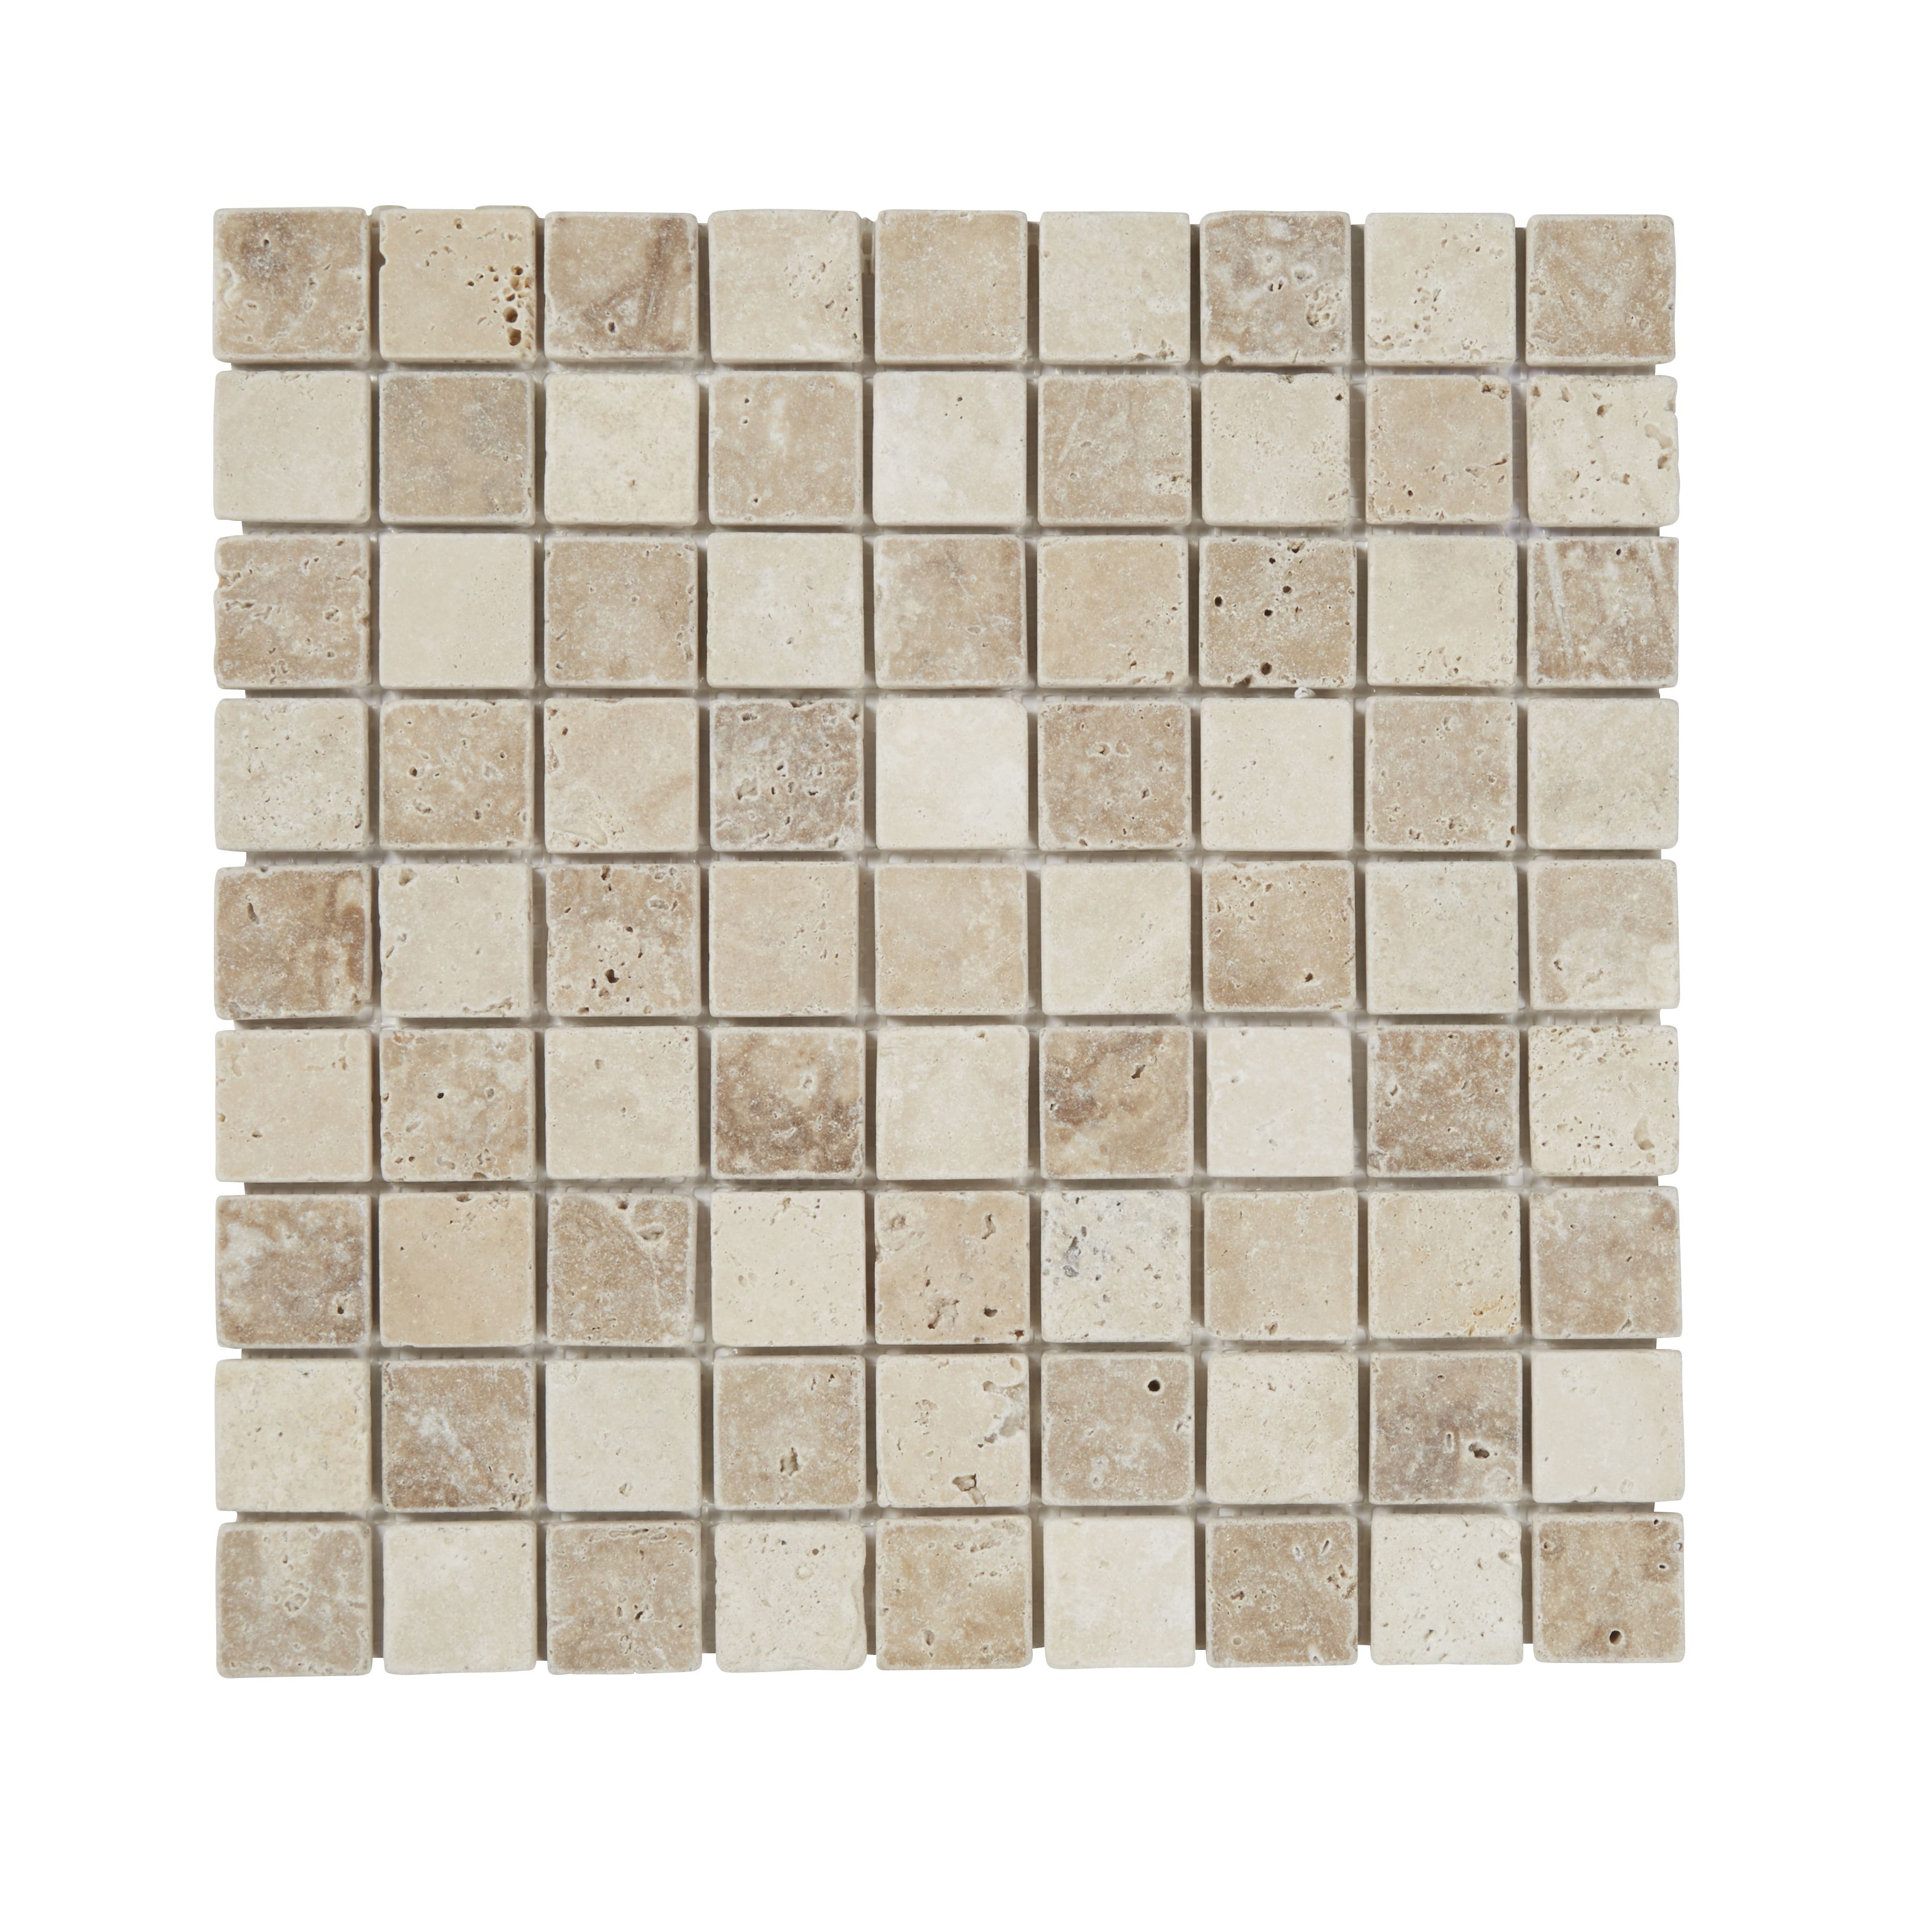 Natural Travertine Mosaic Tile L 300mm W 300mm: Padoue Beige Travertine Mosaic Tile, (L)300mm (W)300mm